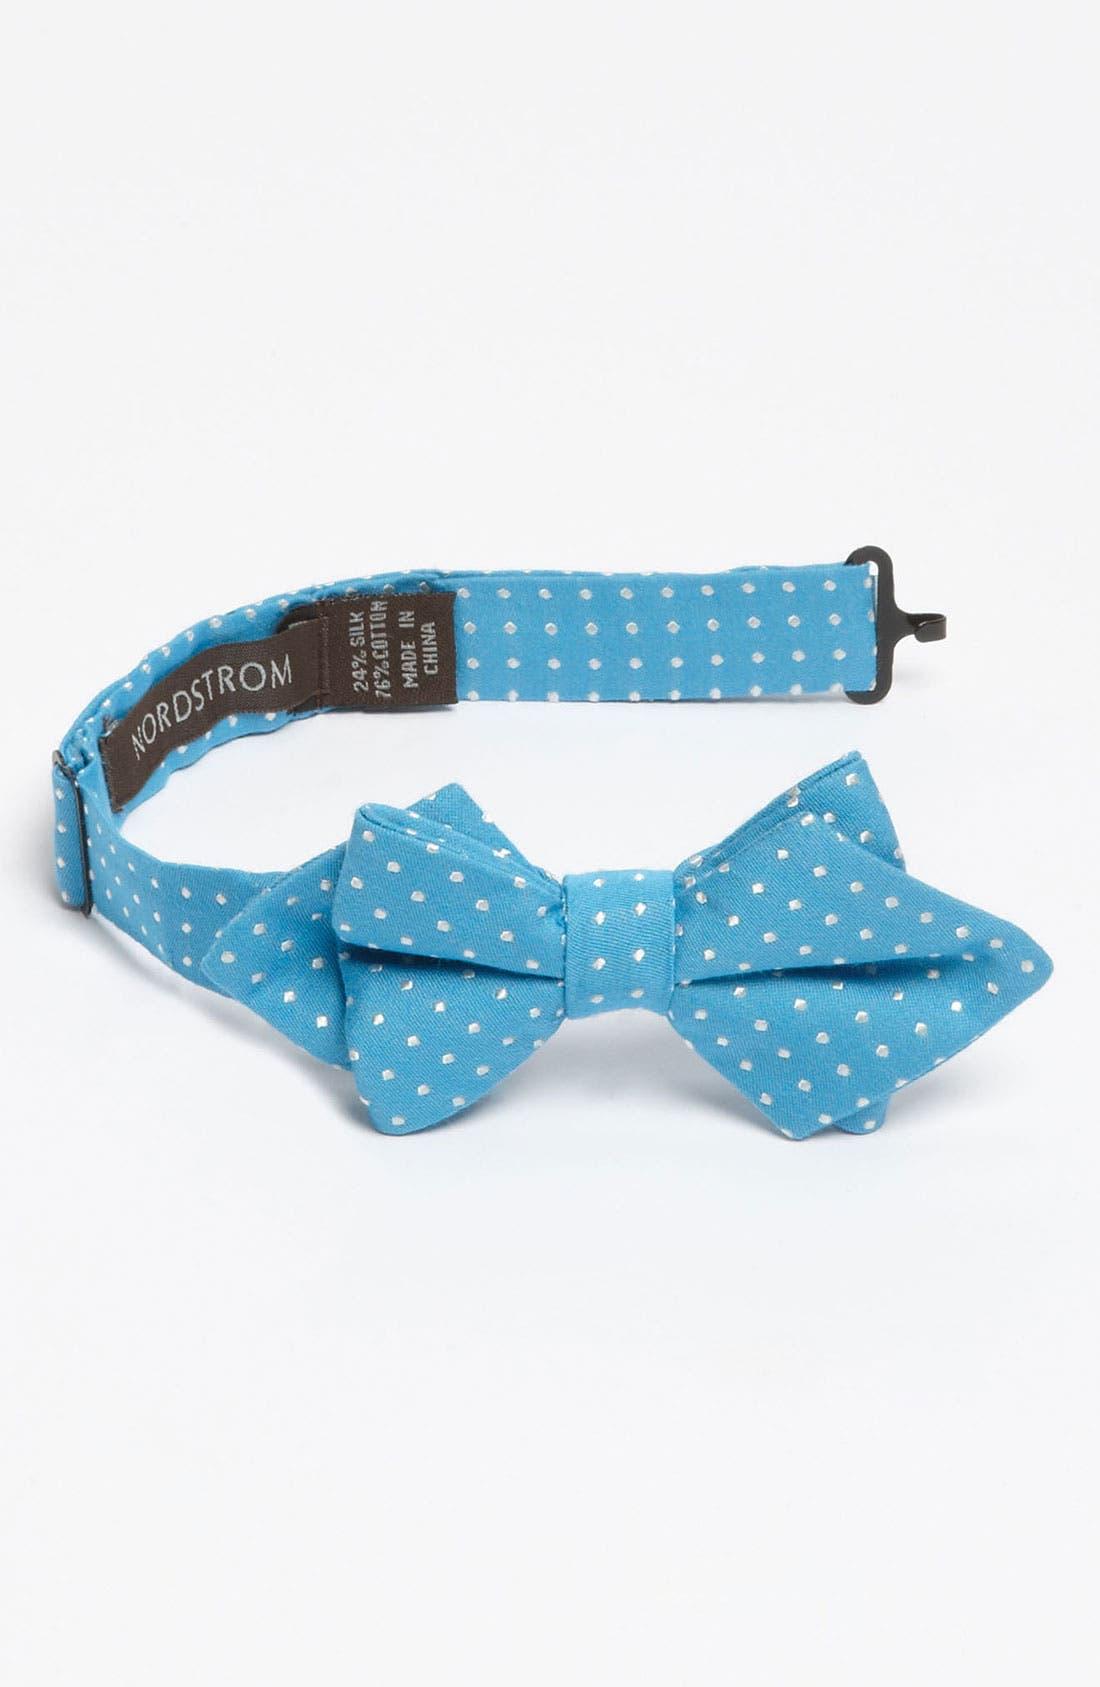 Alternate Image 1 Selected - Nordstrom Cotton Blend Bow Tie (Little Boys)